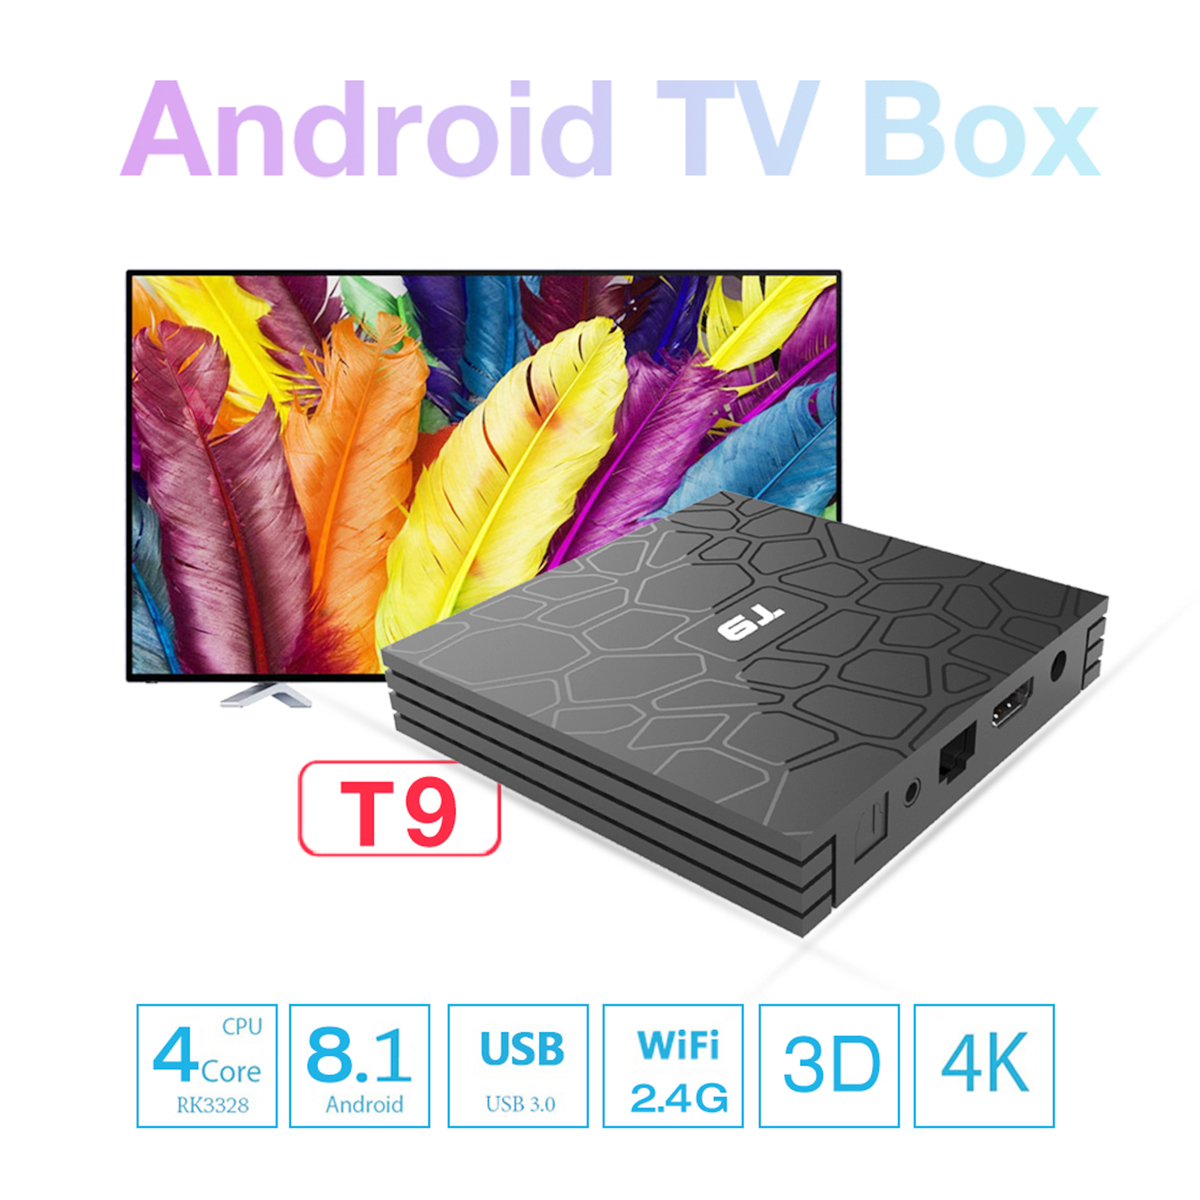 US $43 98 29% OFF|T95 T9 4K TV Box Android 8 1 RK3328 Quad Core 4GB RAM  32GB ROM Set Top Box with USB 3 0 Smart TV Box Netflix Media Player-in  Set-top